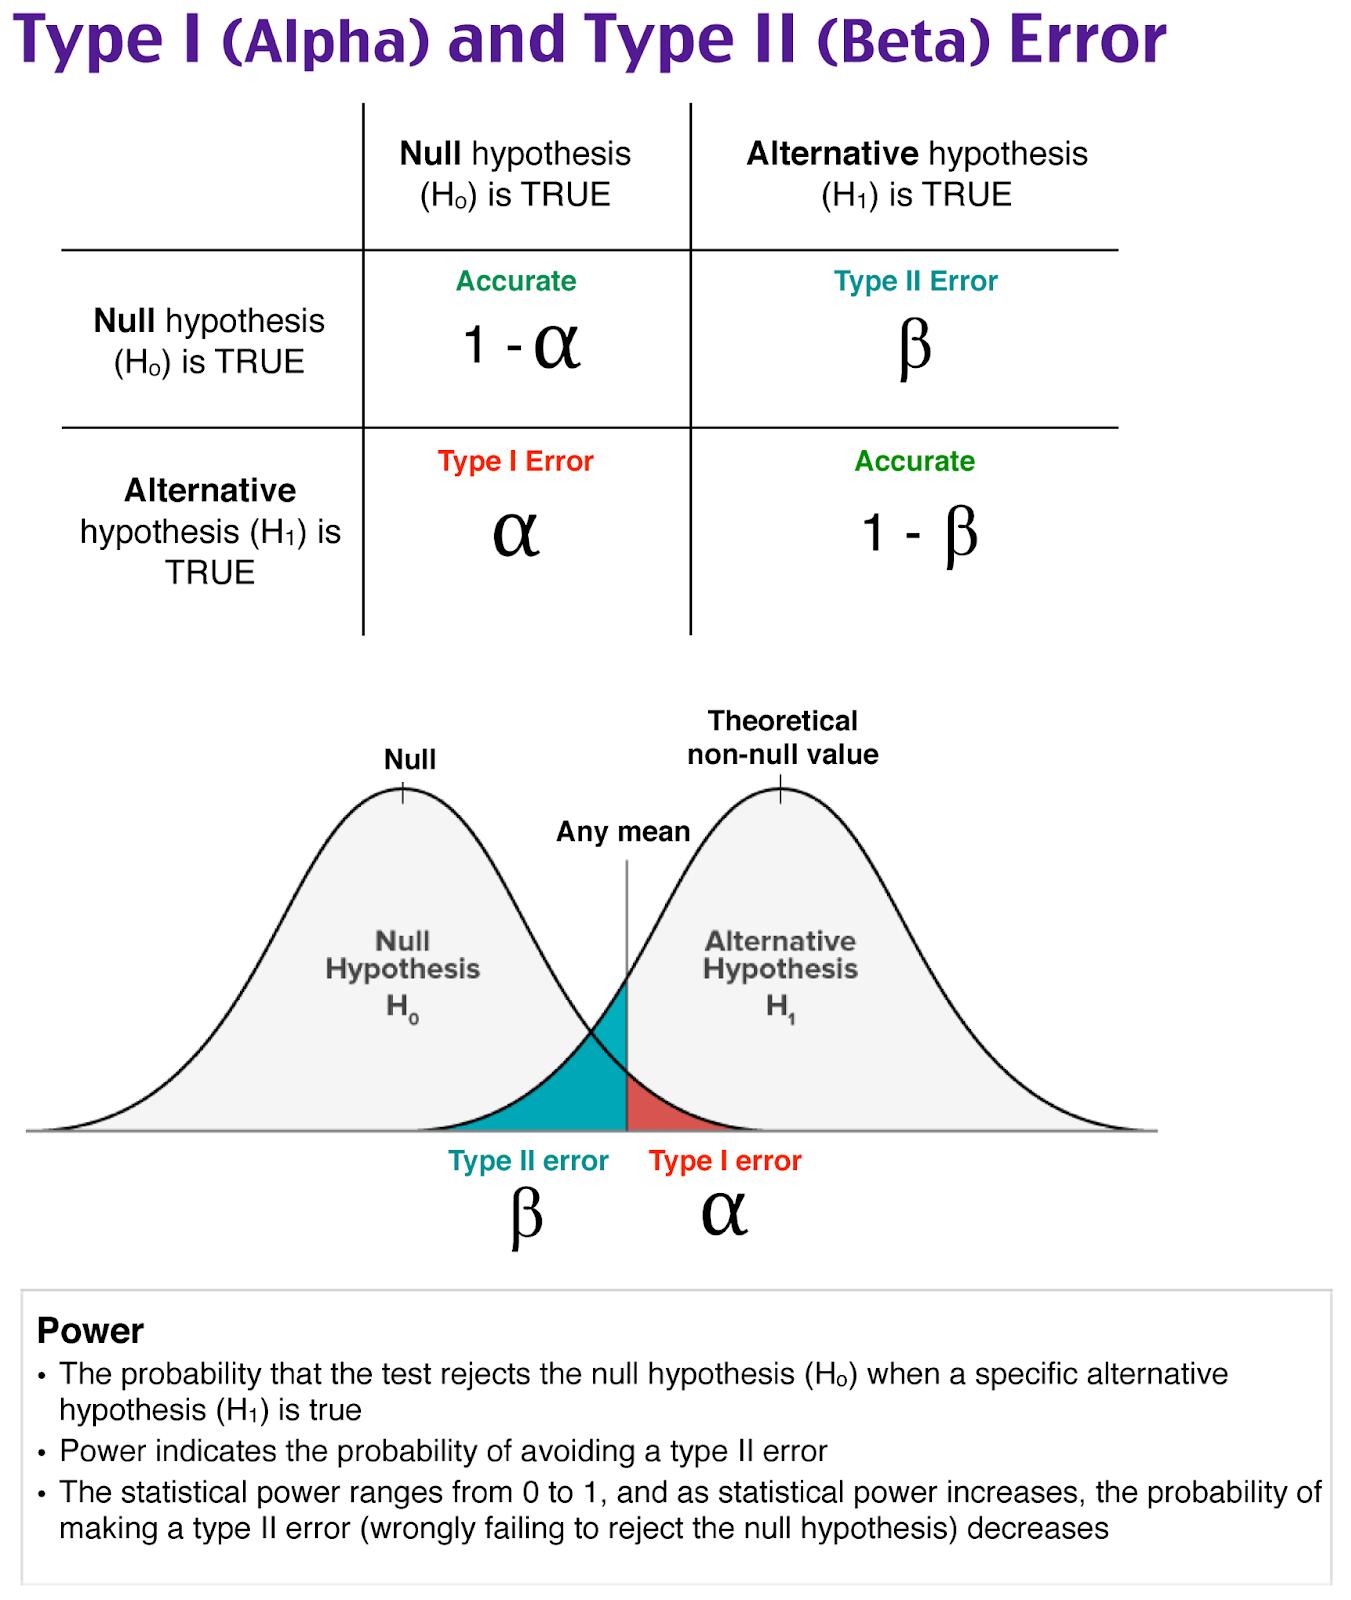 Type I and Type II Error, Alpha, Beta, Null Hypothesis